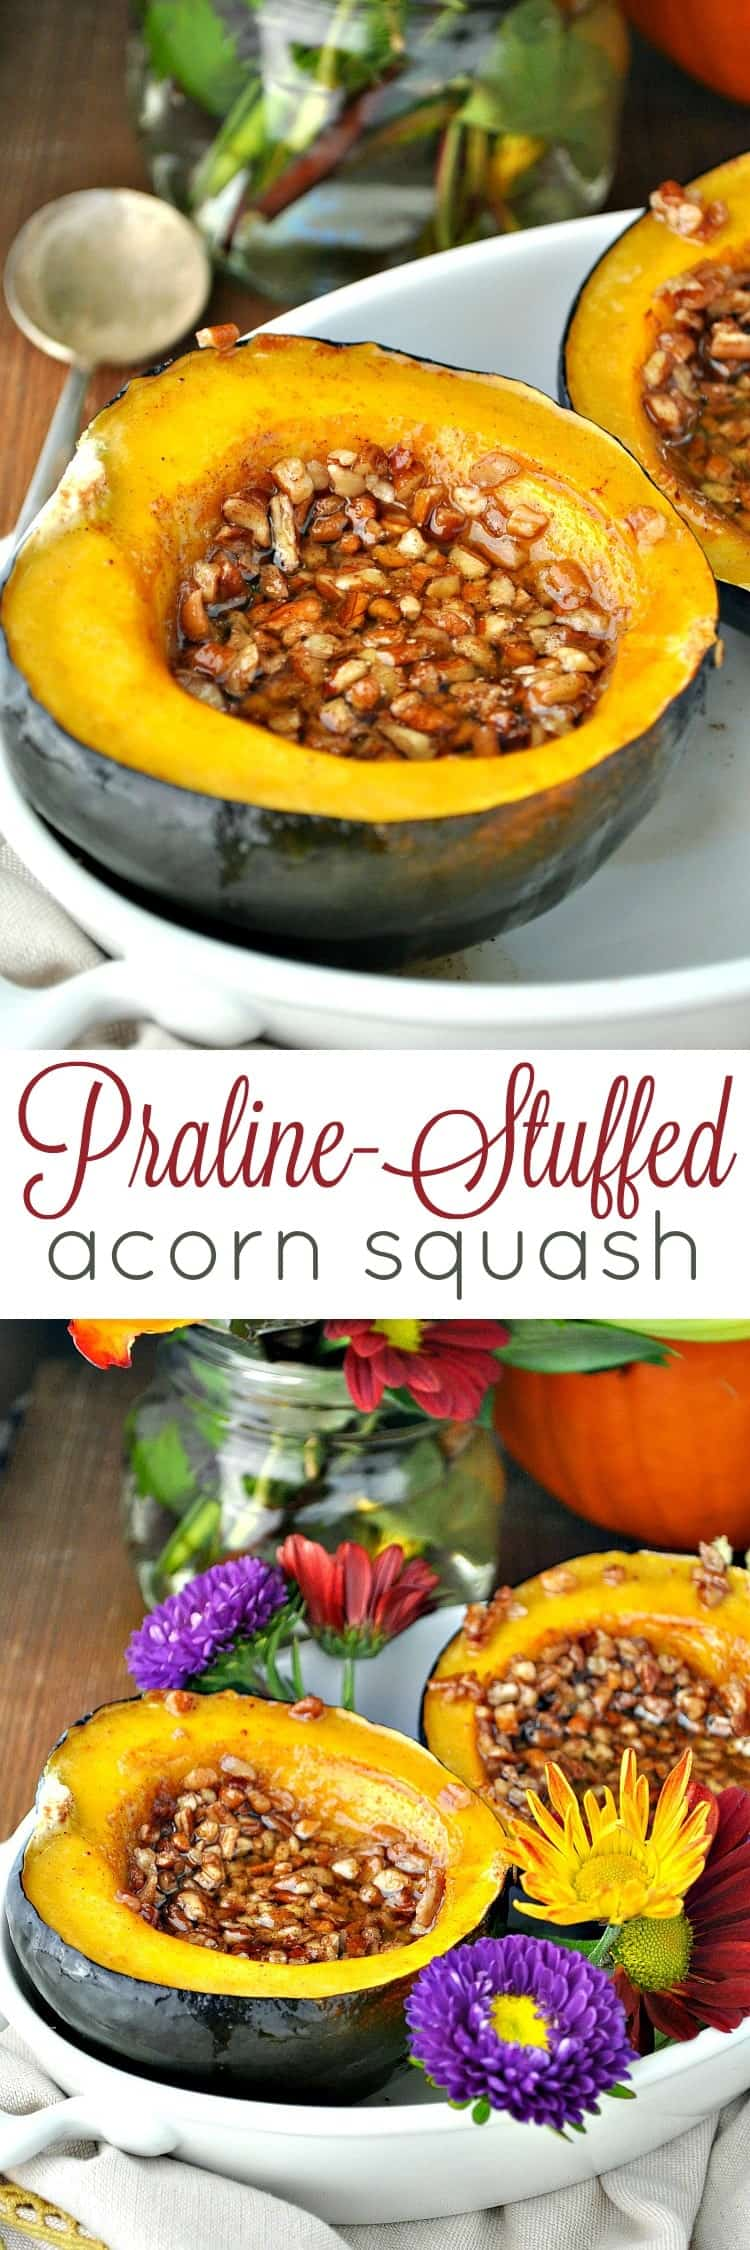 Praline Stuffed Acorn Squash